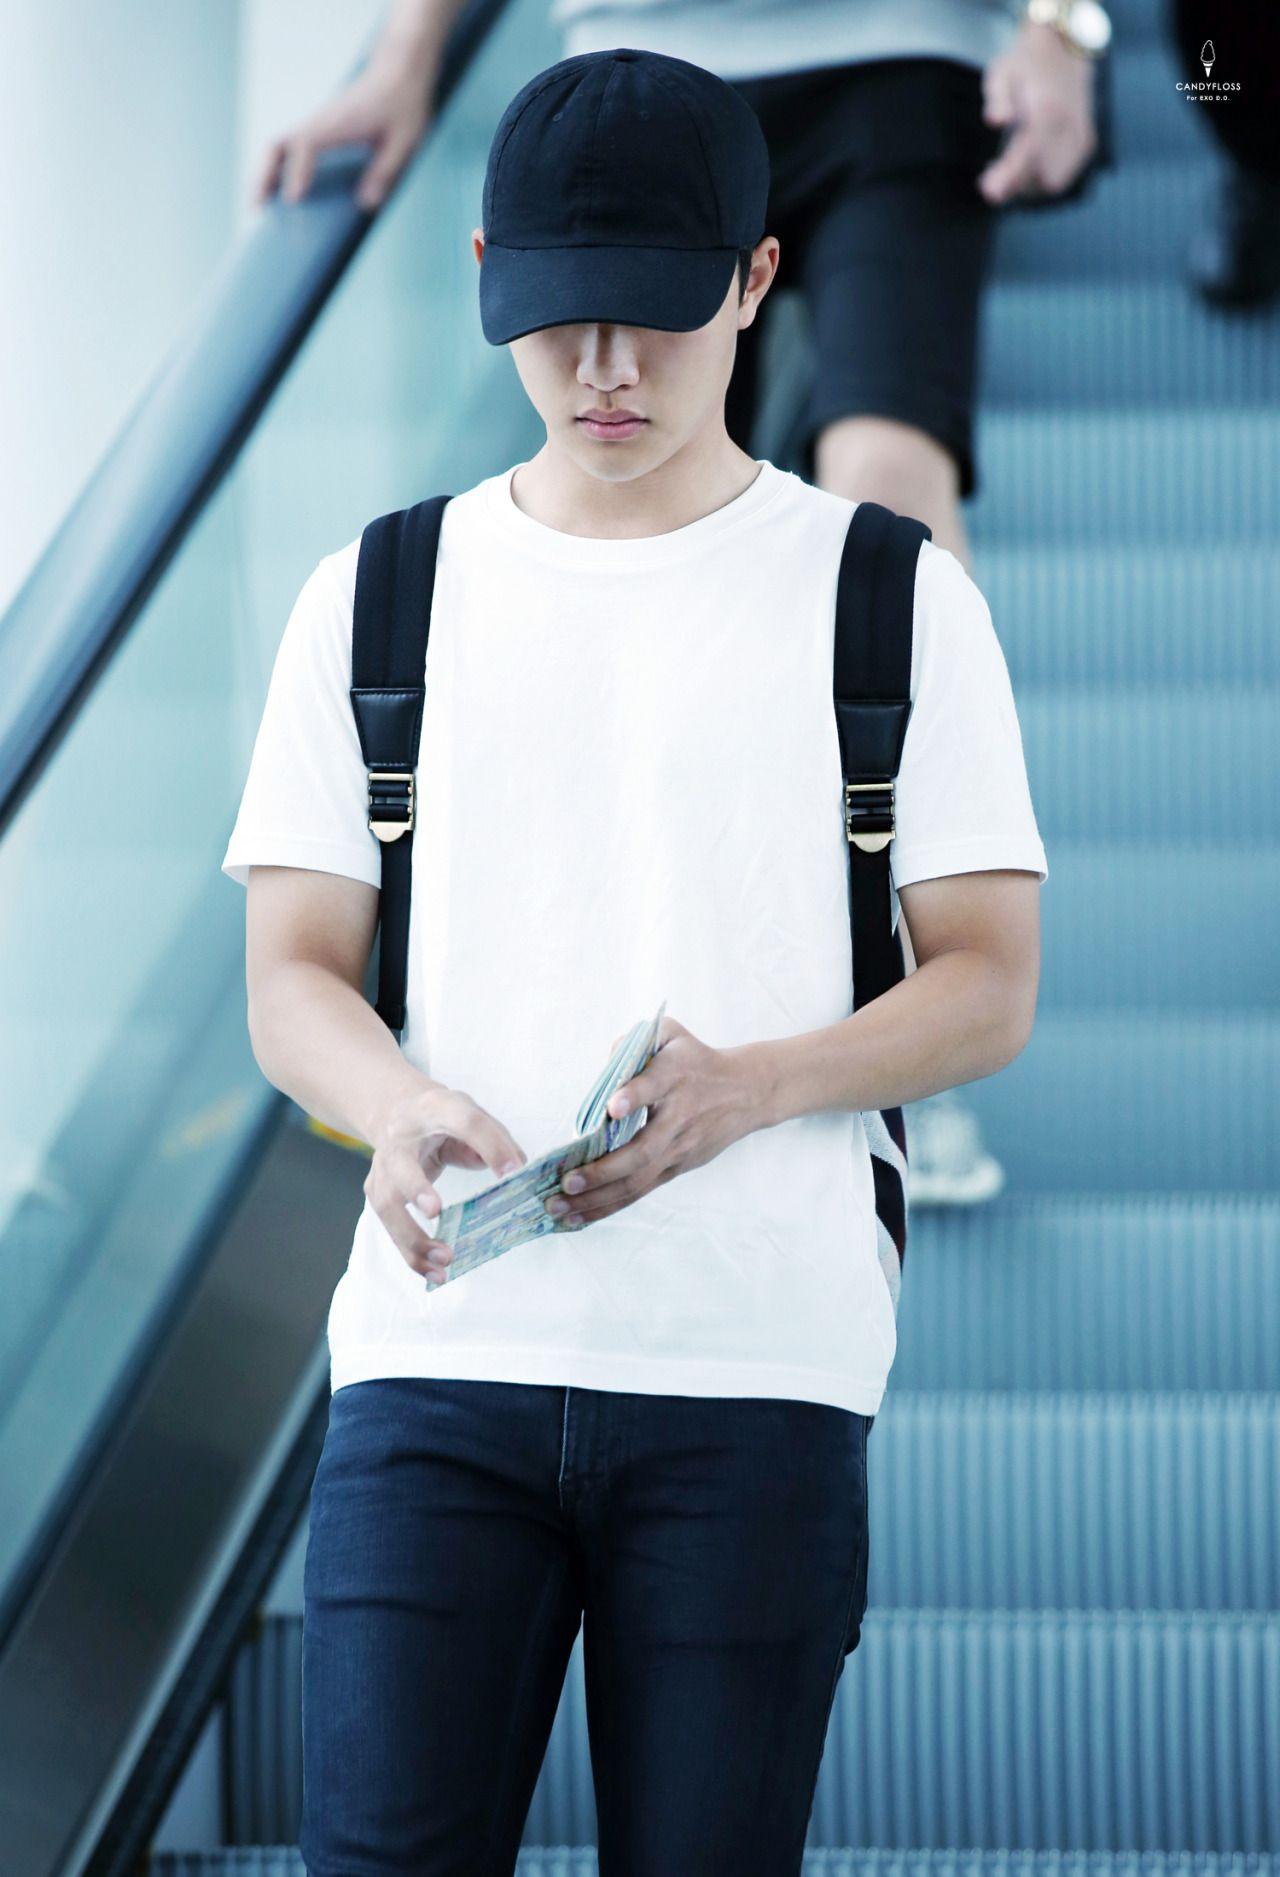 Incheon Airport to Hong Kong 150816 : D.O.